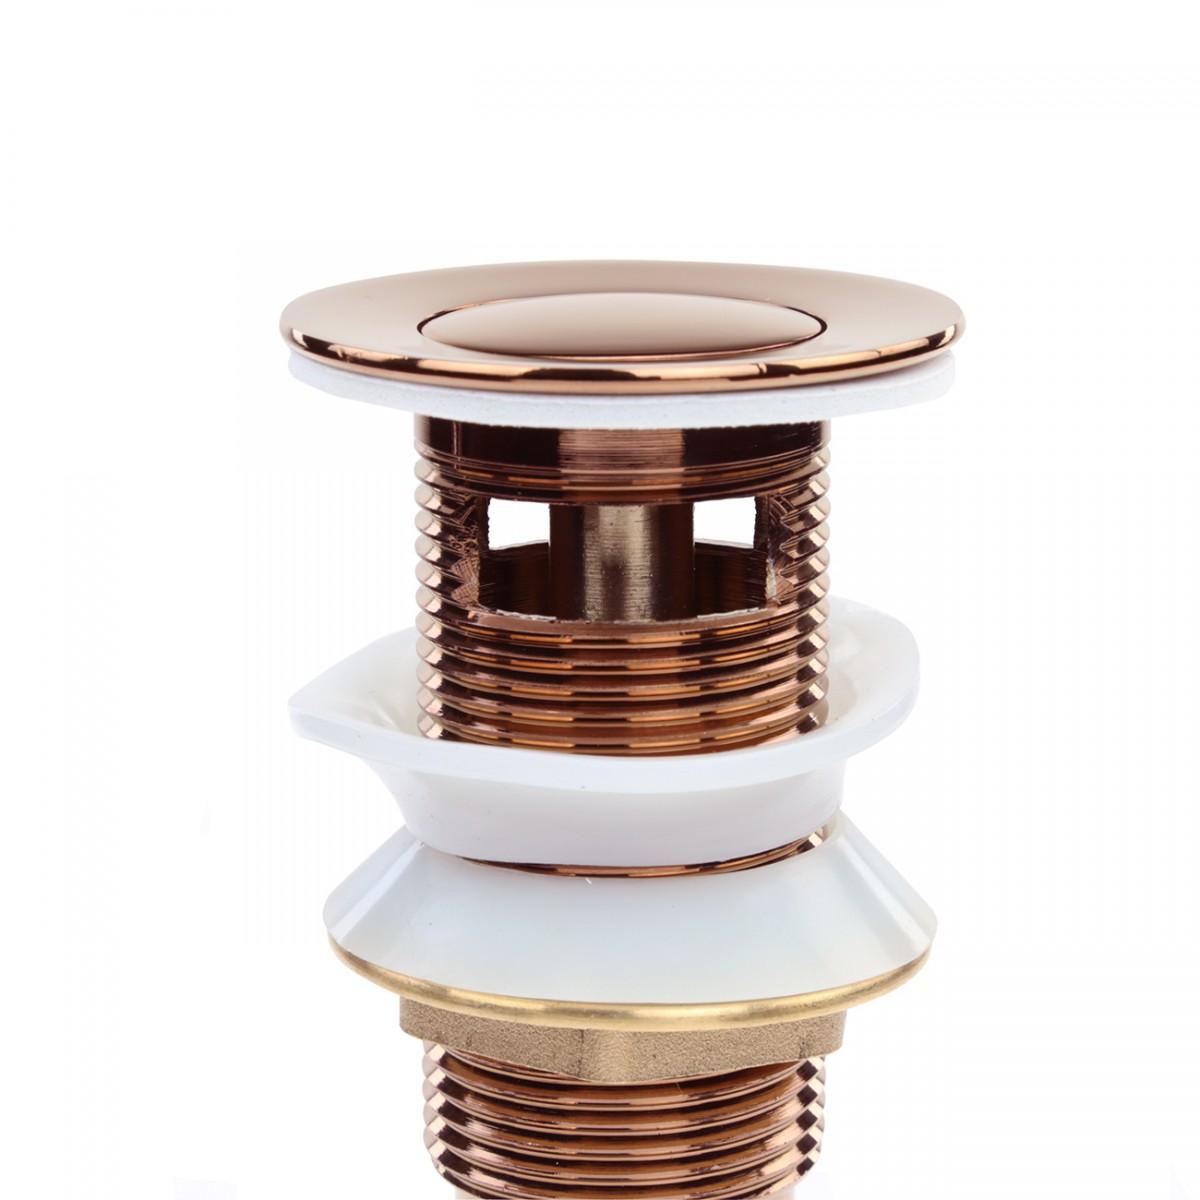 Rose Gold Bathroom Sink Drain Overflow Pop up PopUp Drains 1 34 Drain Opening 1 14 Standard Pipe